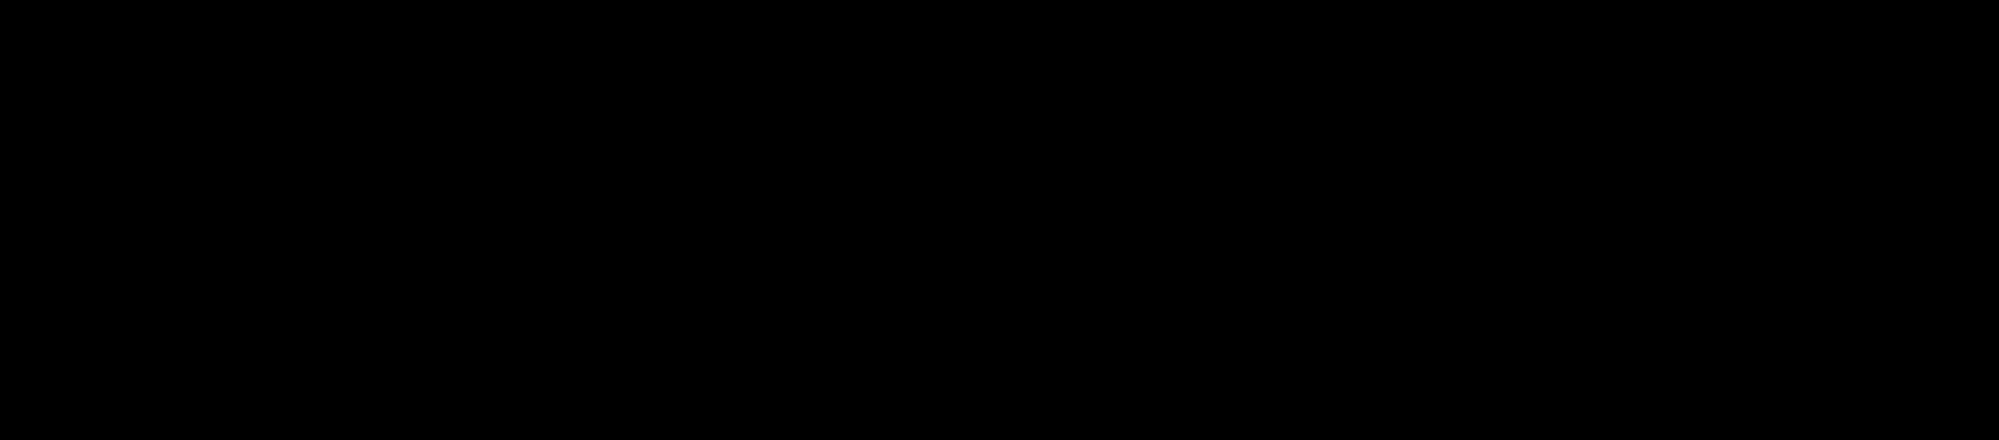 image43.png